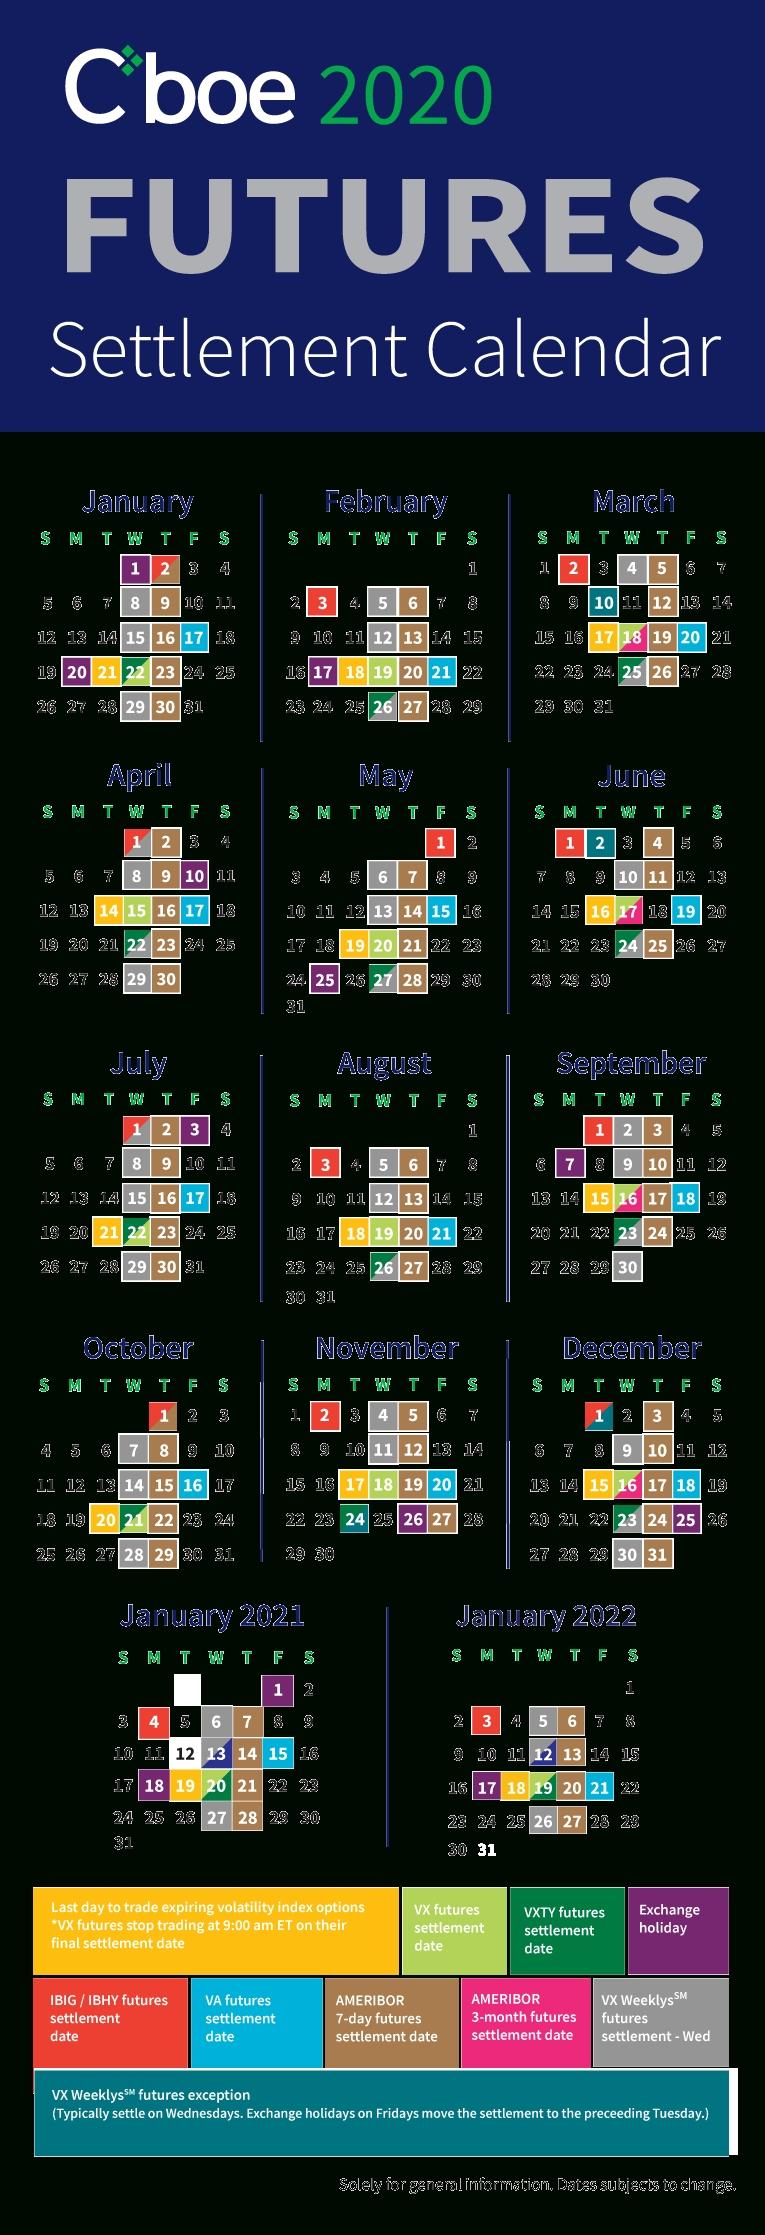 Cfe Expiration & Holiday Calendars